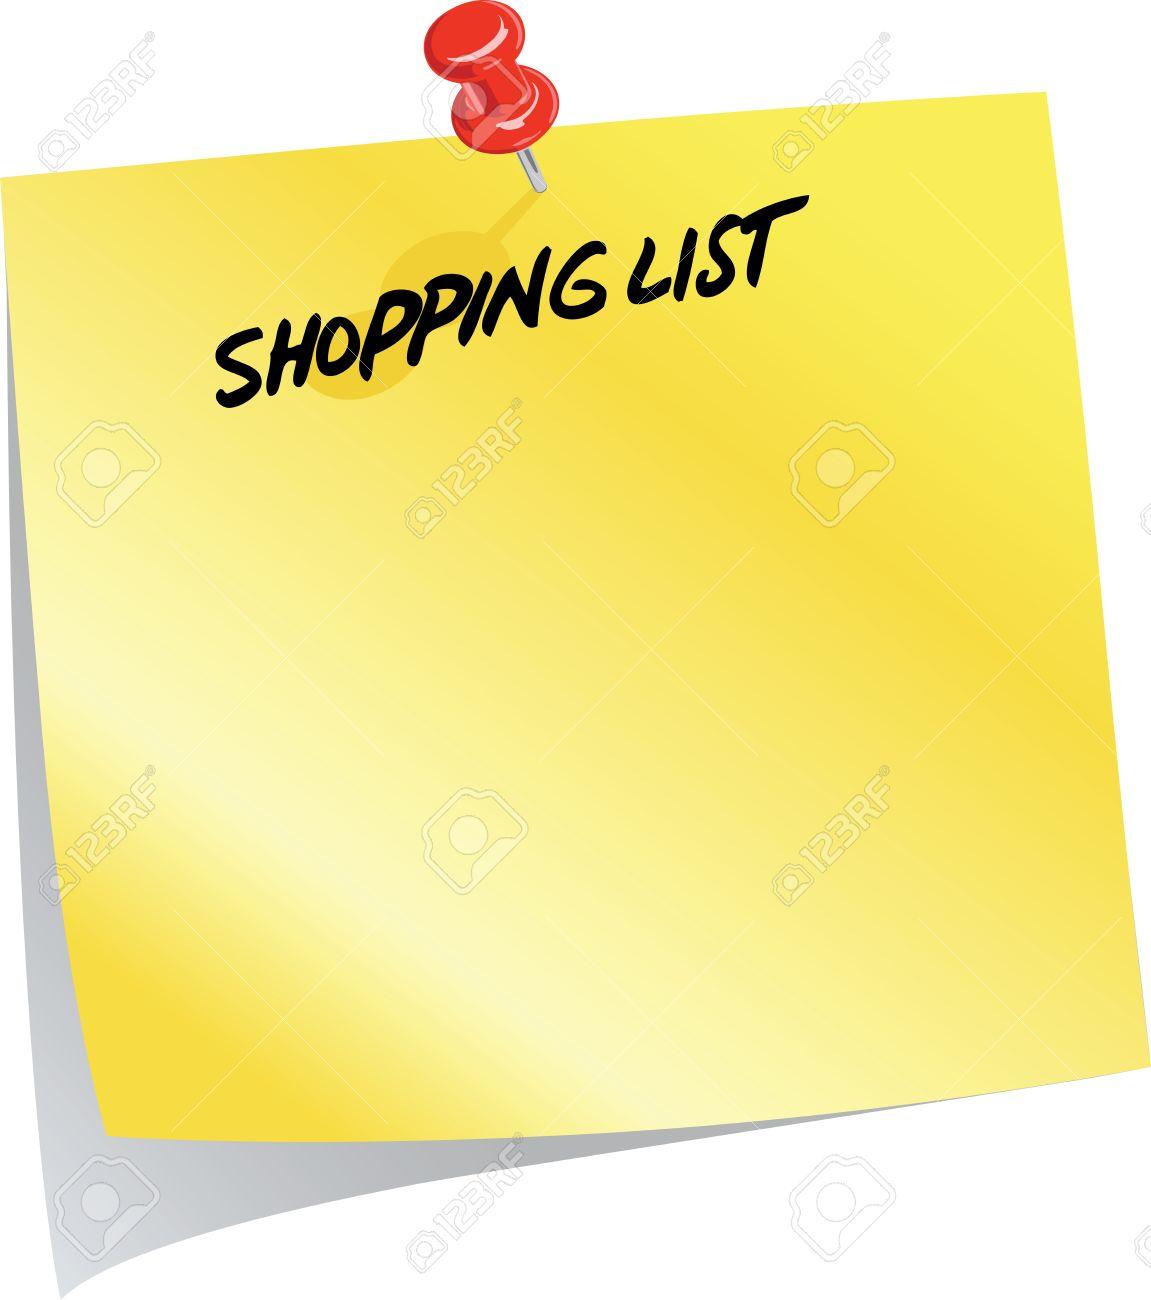 Image result for Clip Art Shopping List